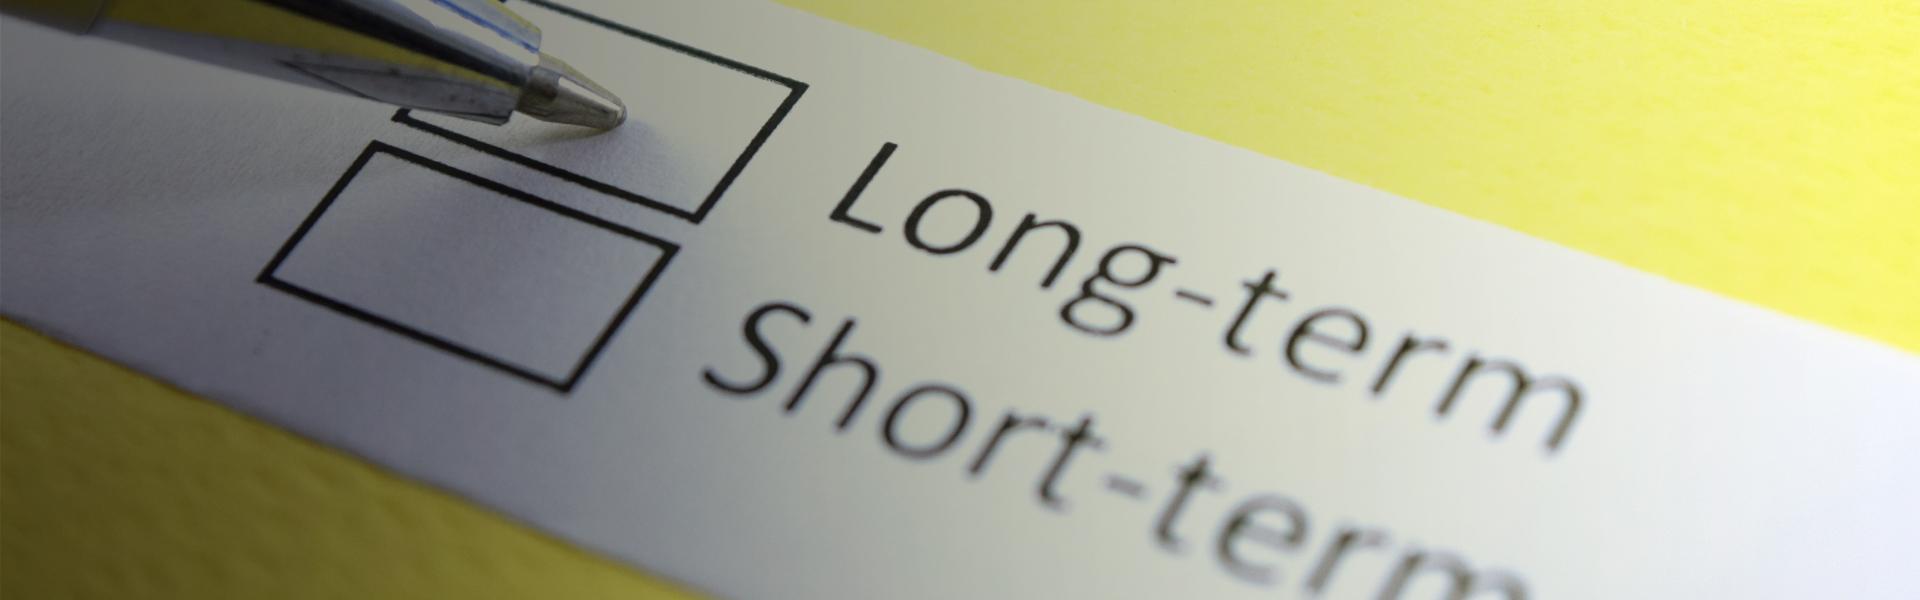 Short & long term storage